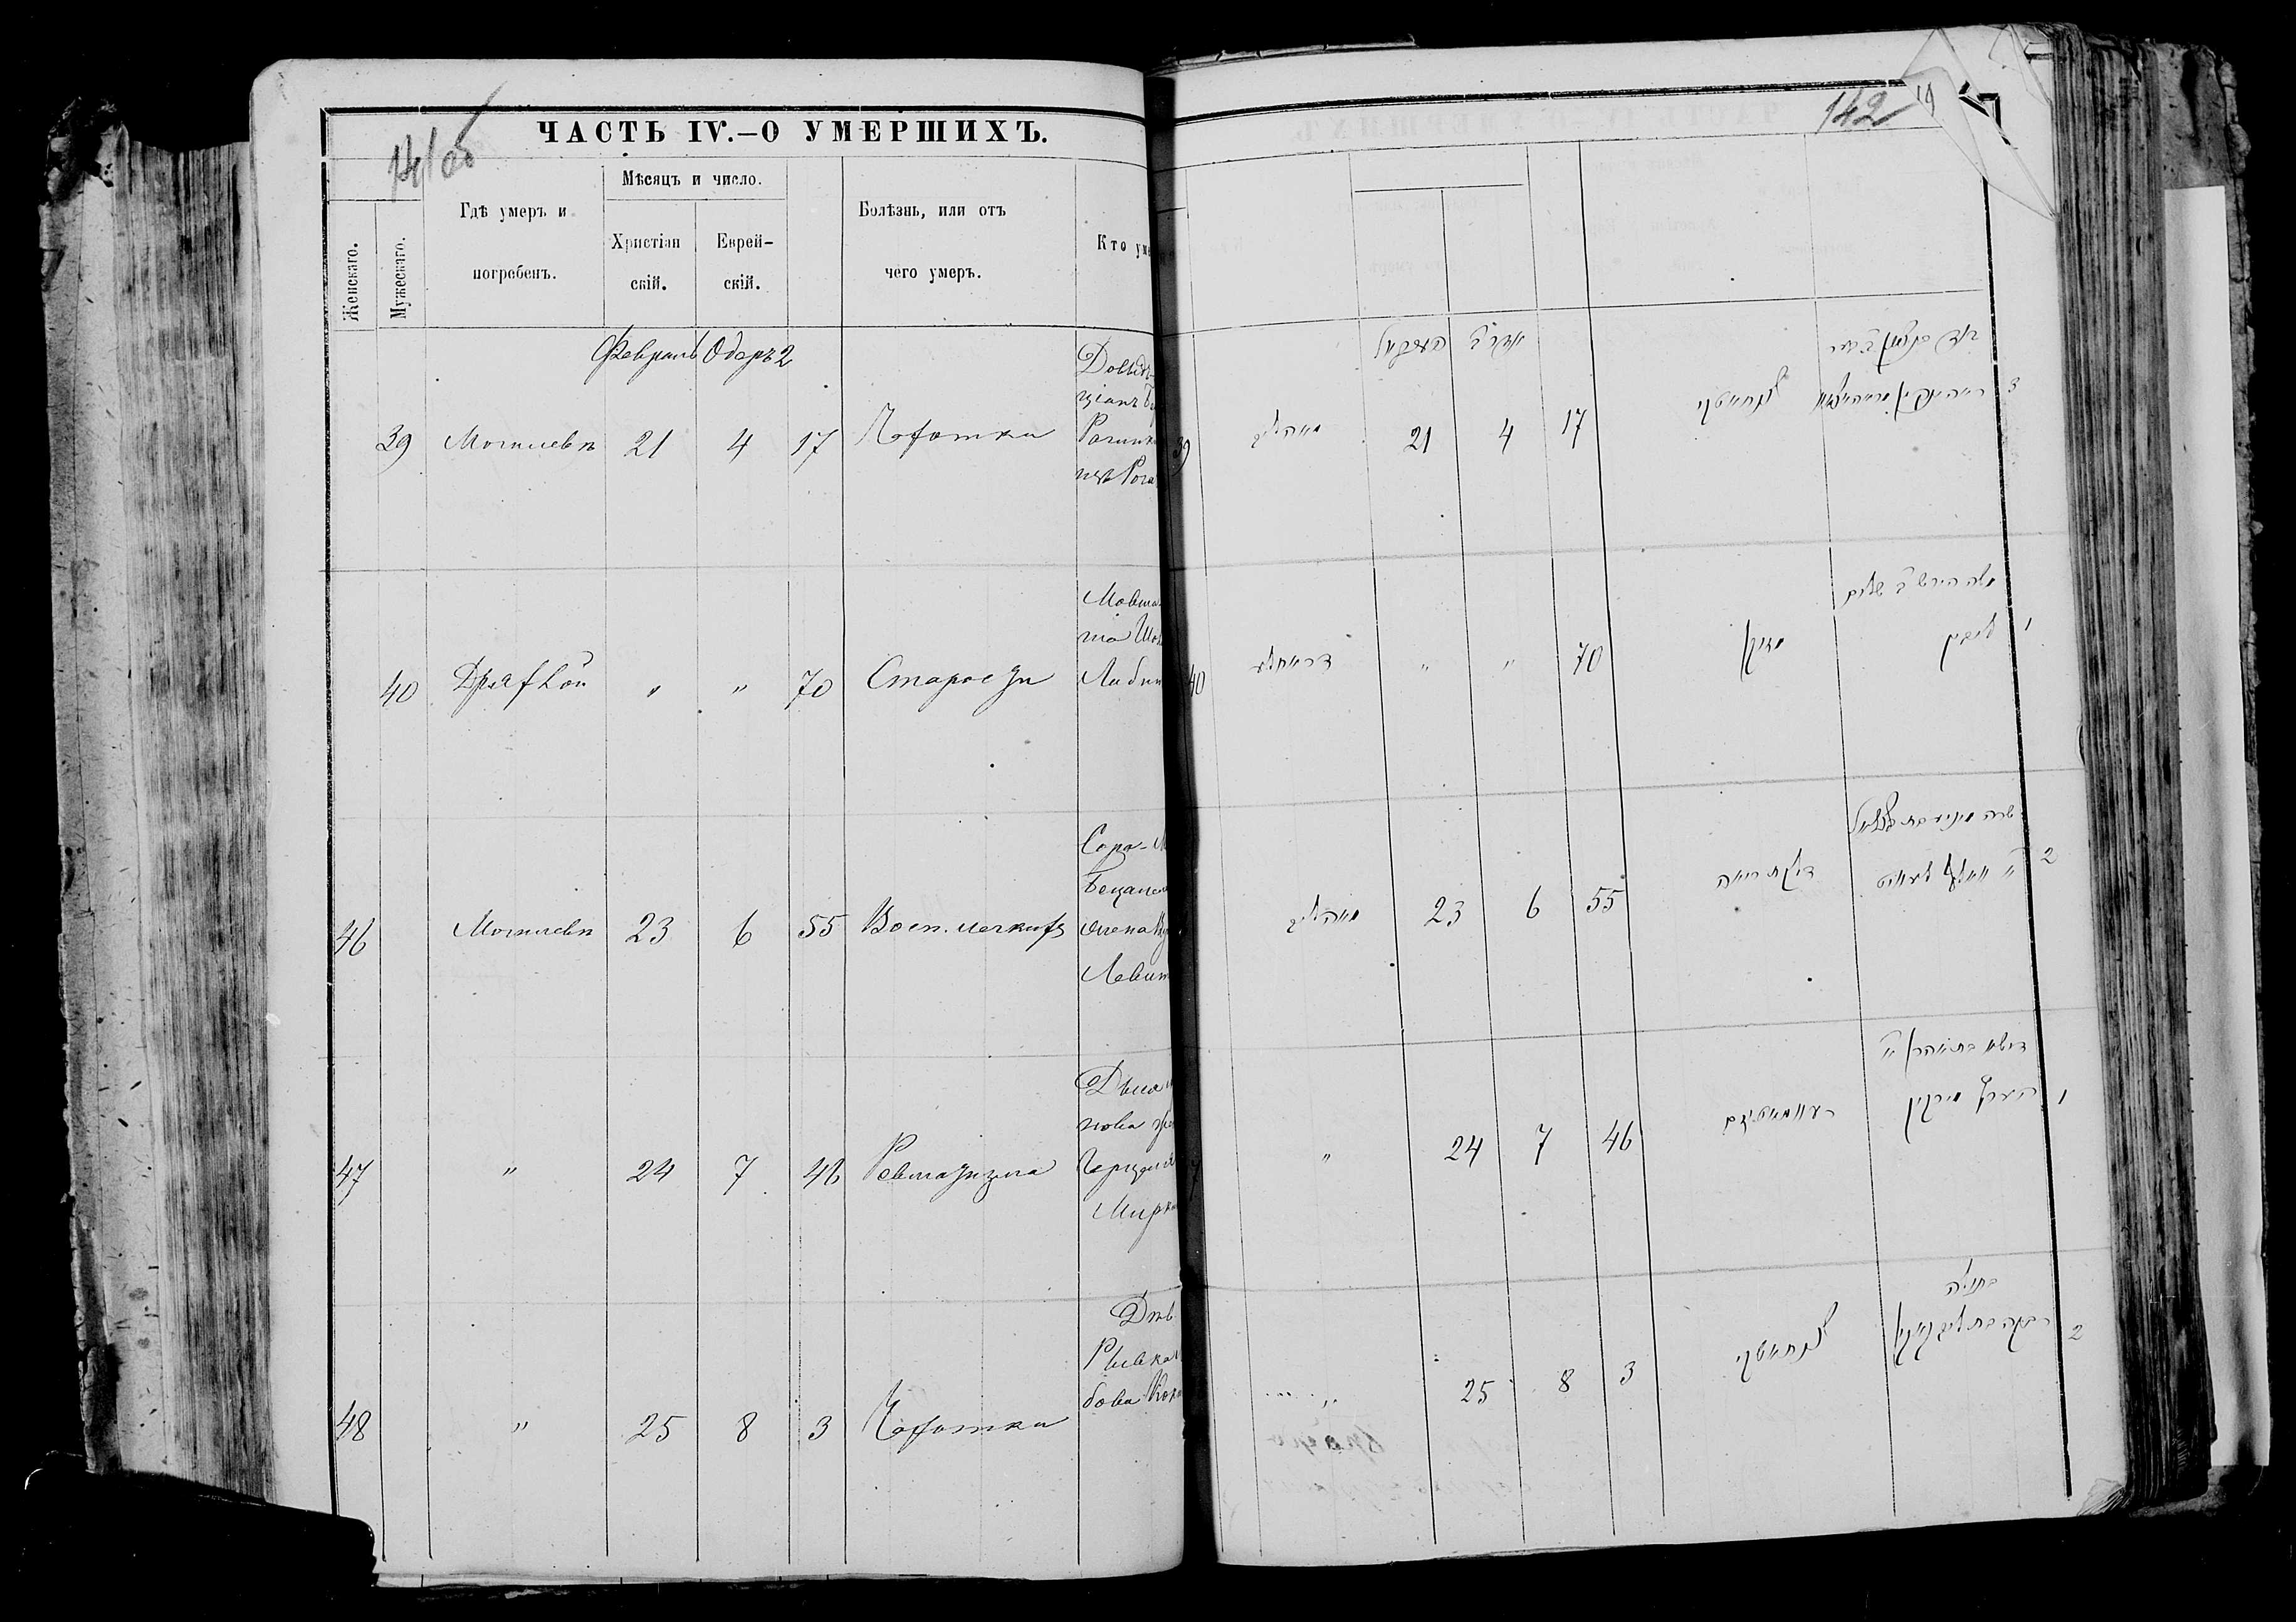 Дыся Ароновна Миркина, жена Герцля Миркина ум. 24 февраля 1881, запись 47, пленка 007766481, снимок 207